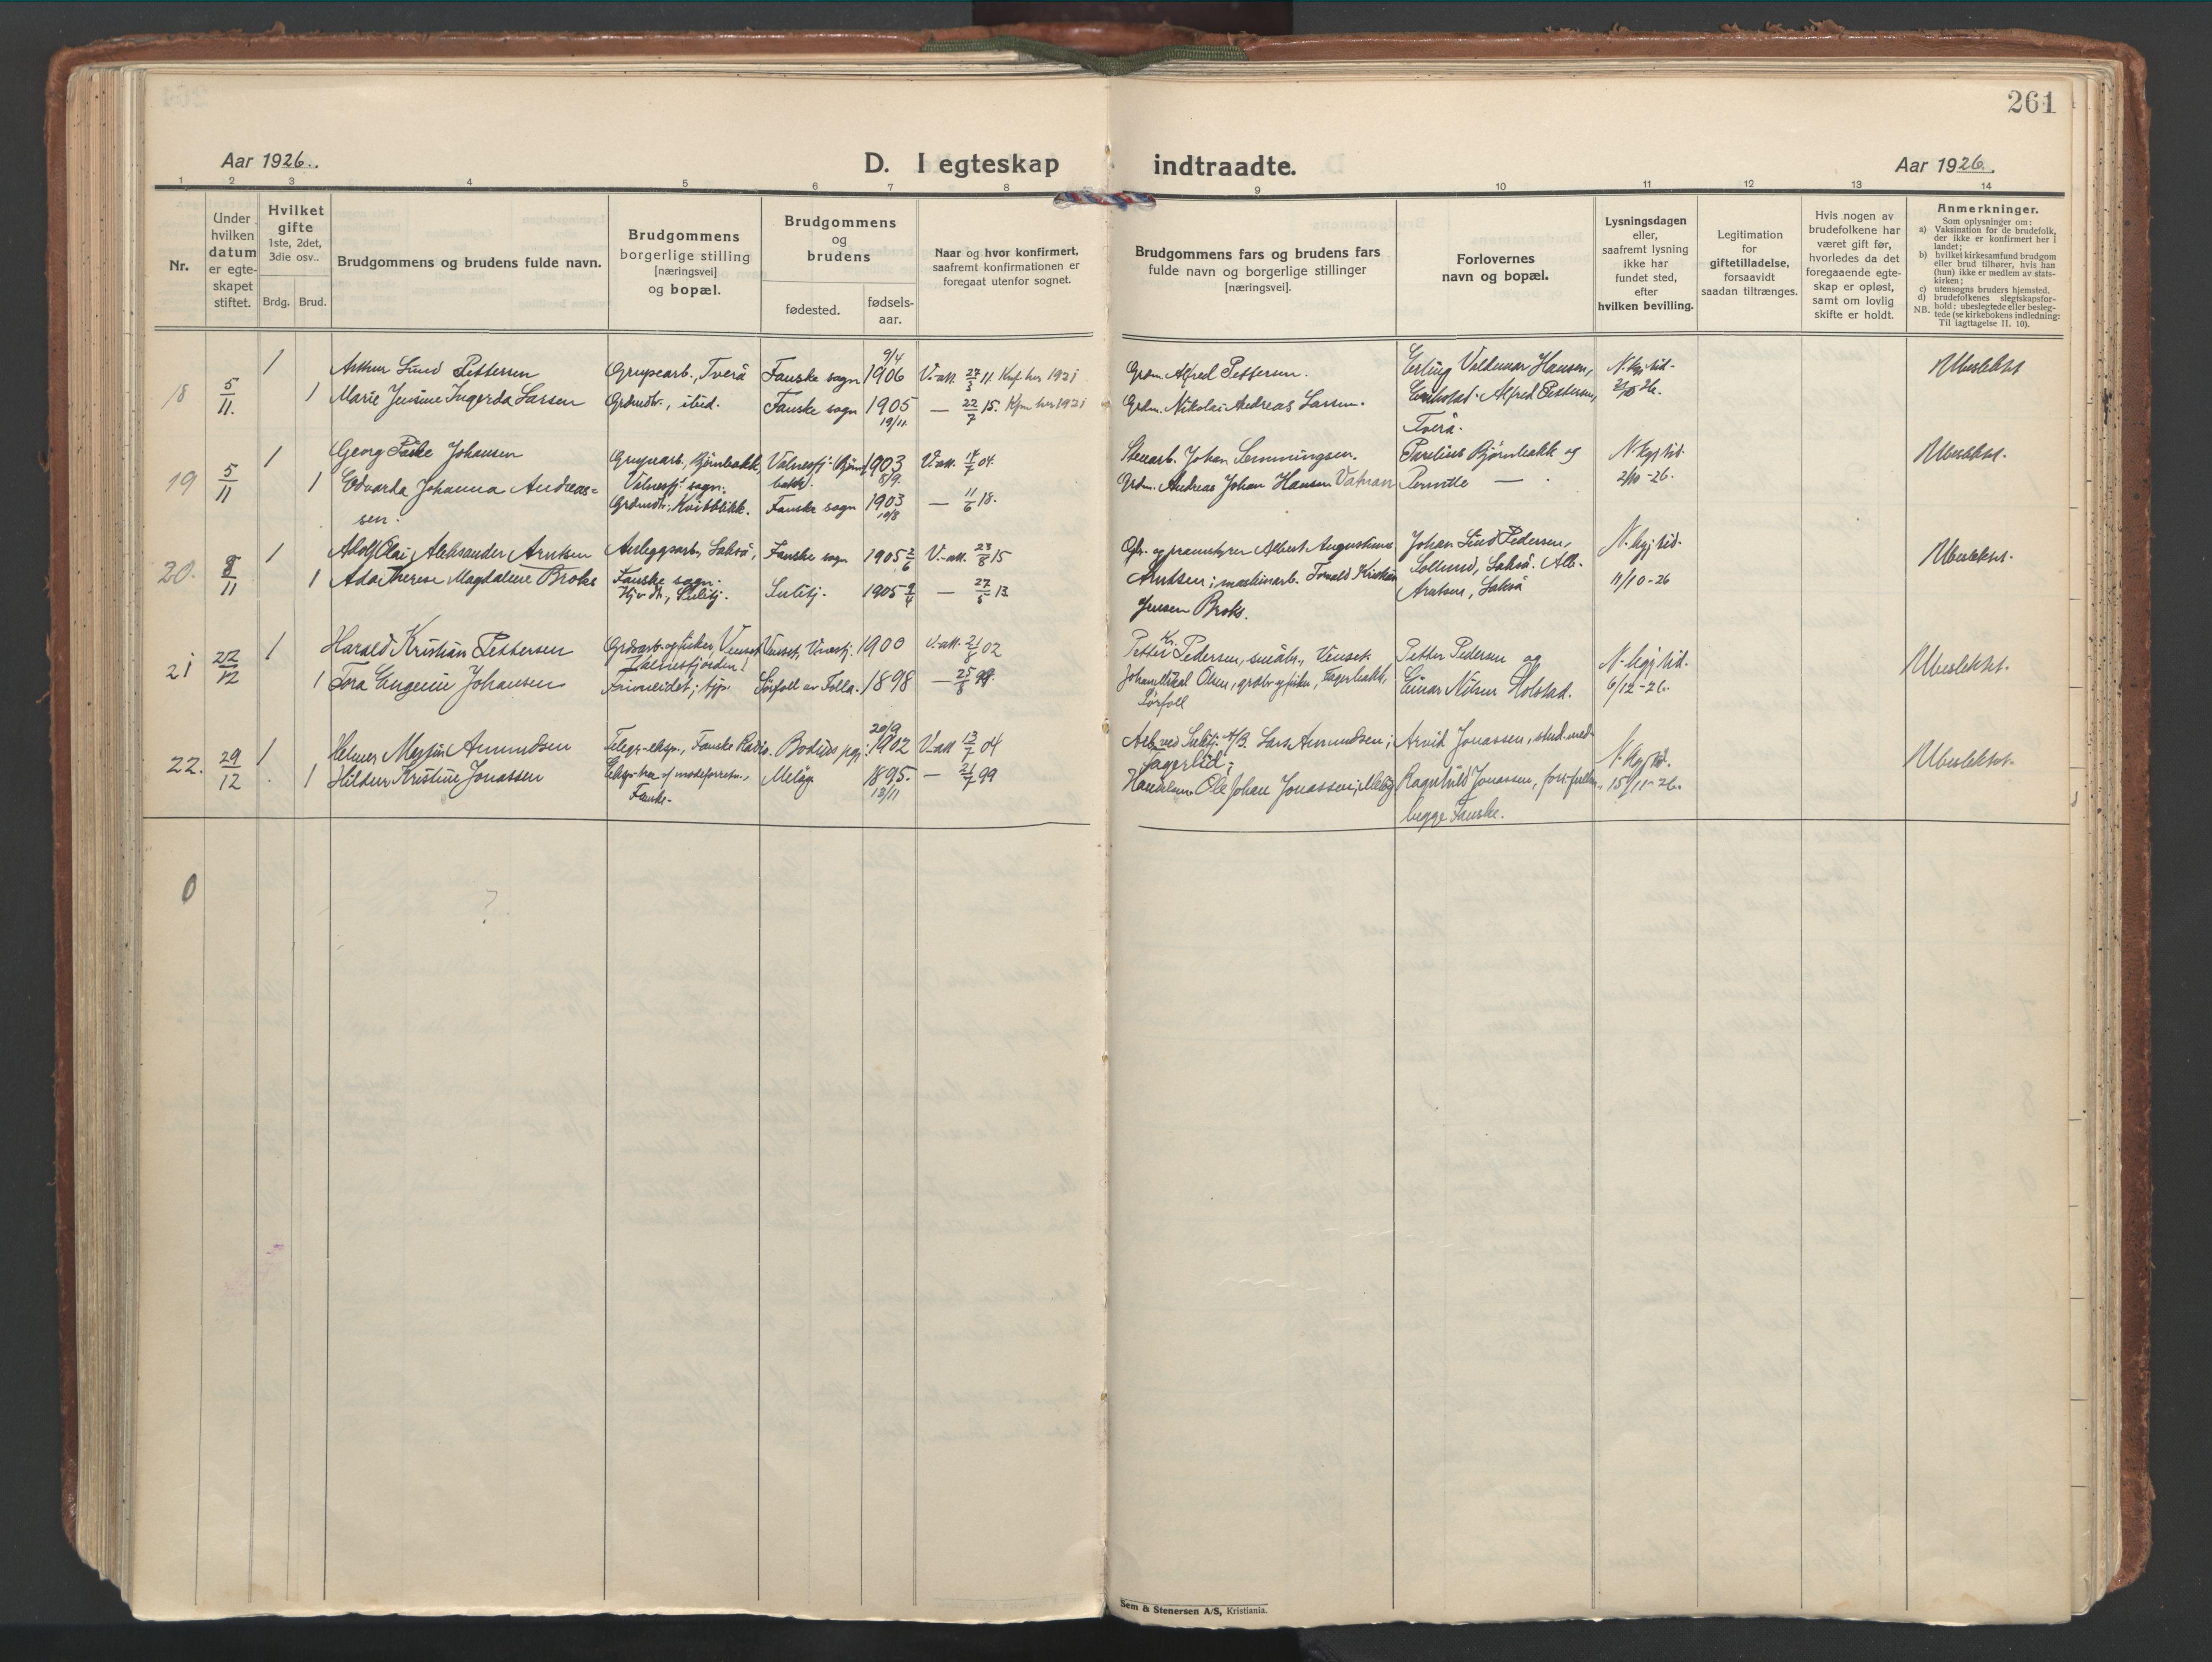 SAT, Ministerialprotokoller, klokkerbøker og fødselsregistre - Nordland, 849/L0699: Ministerialbok nr. 849A10, 1924-1937, s. 261